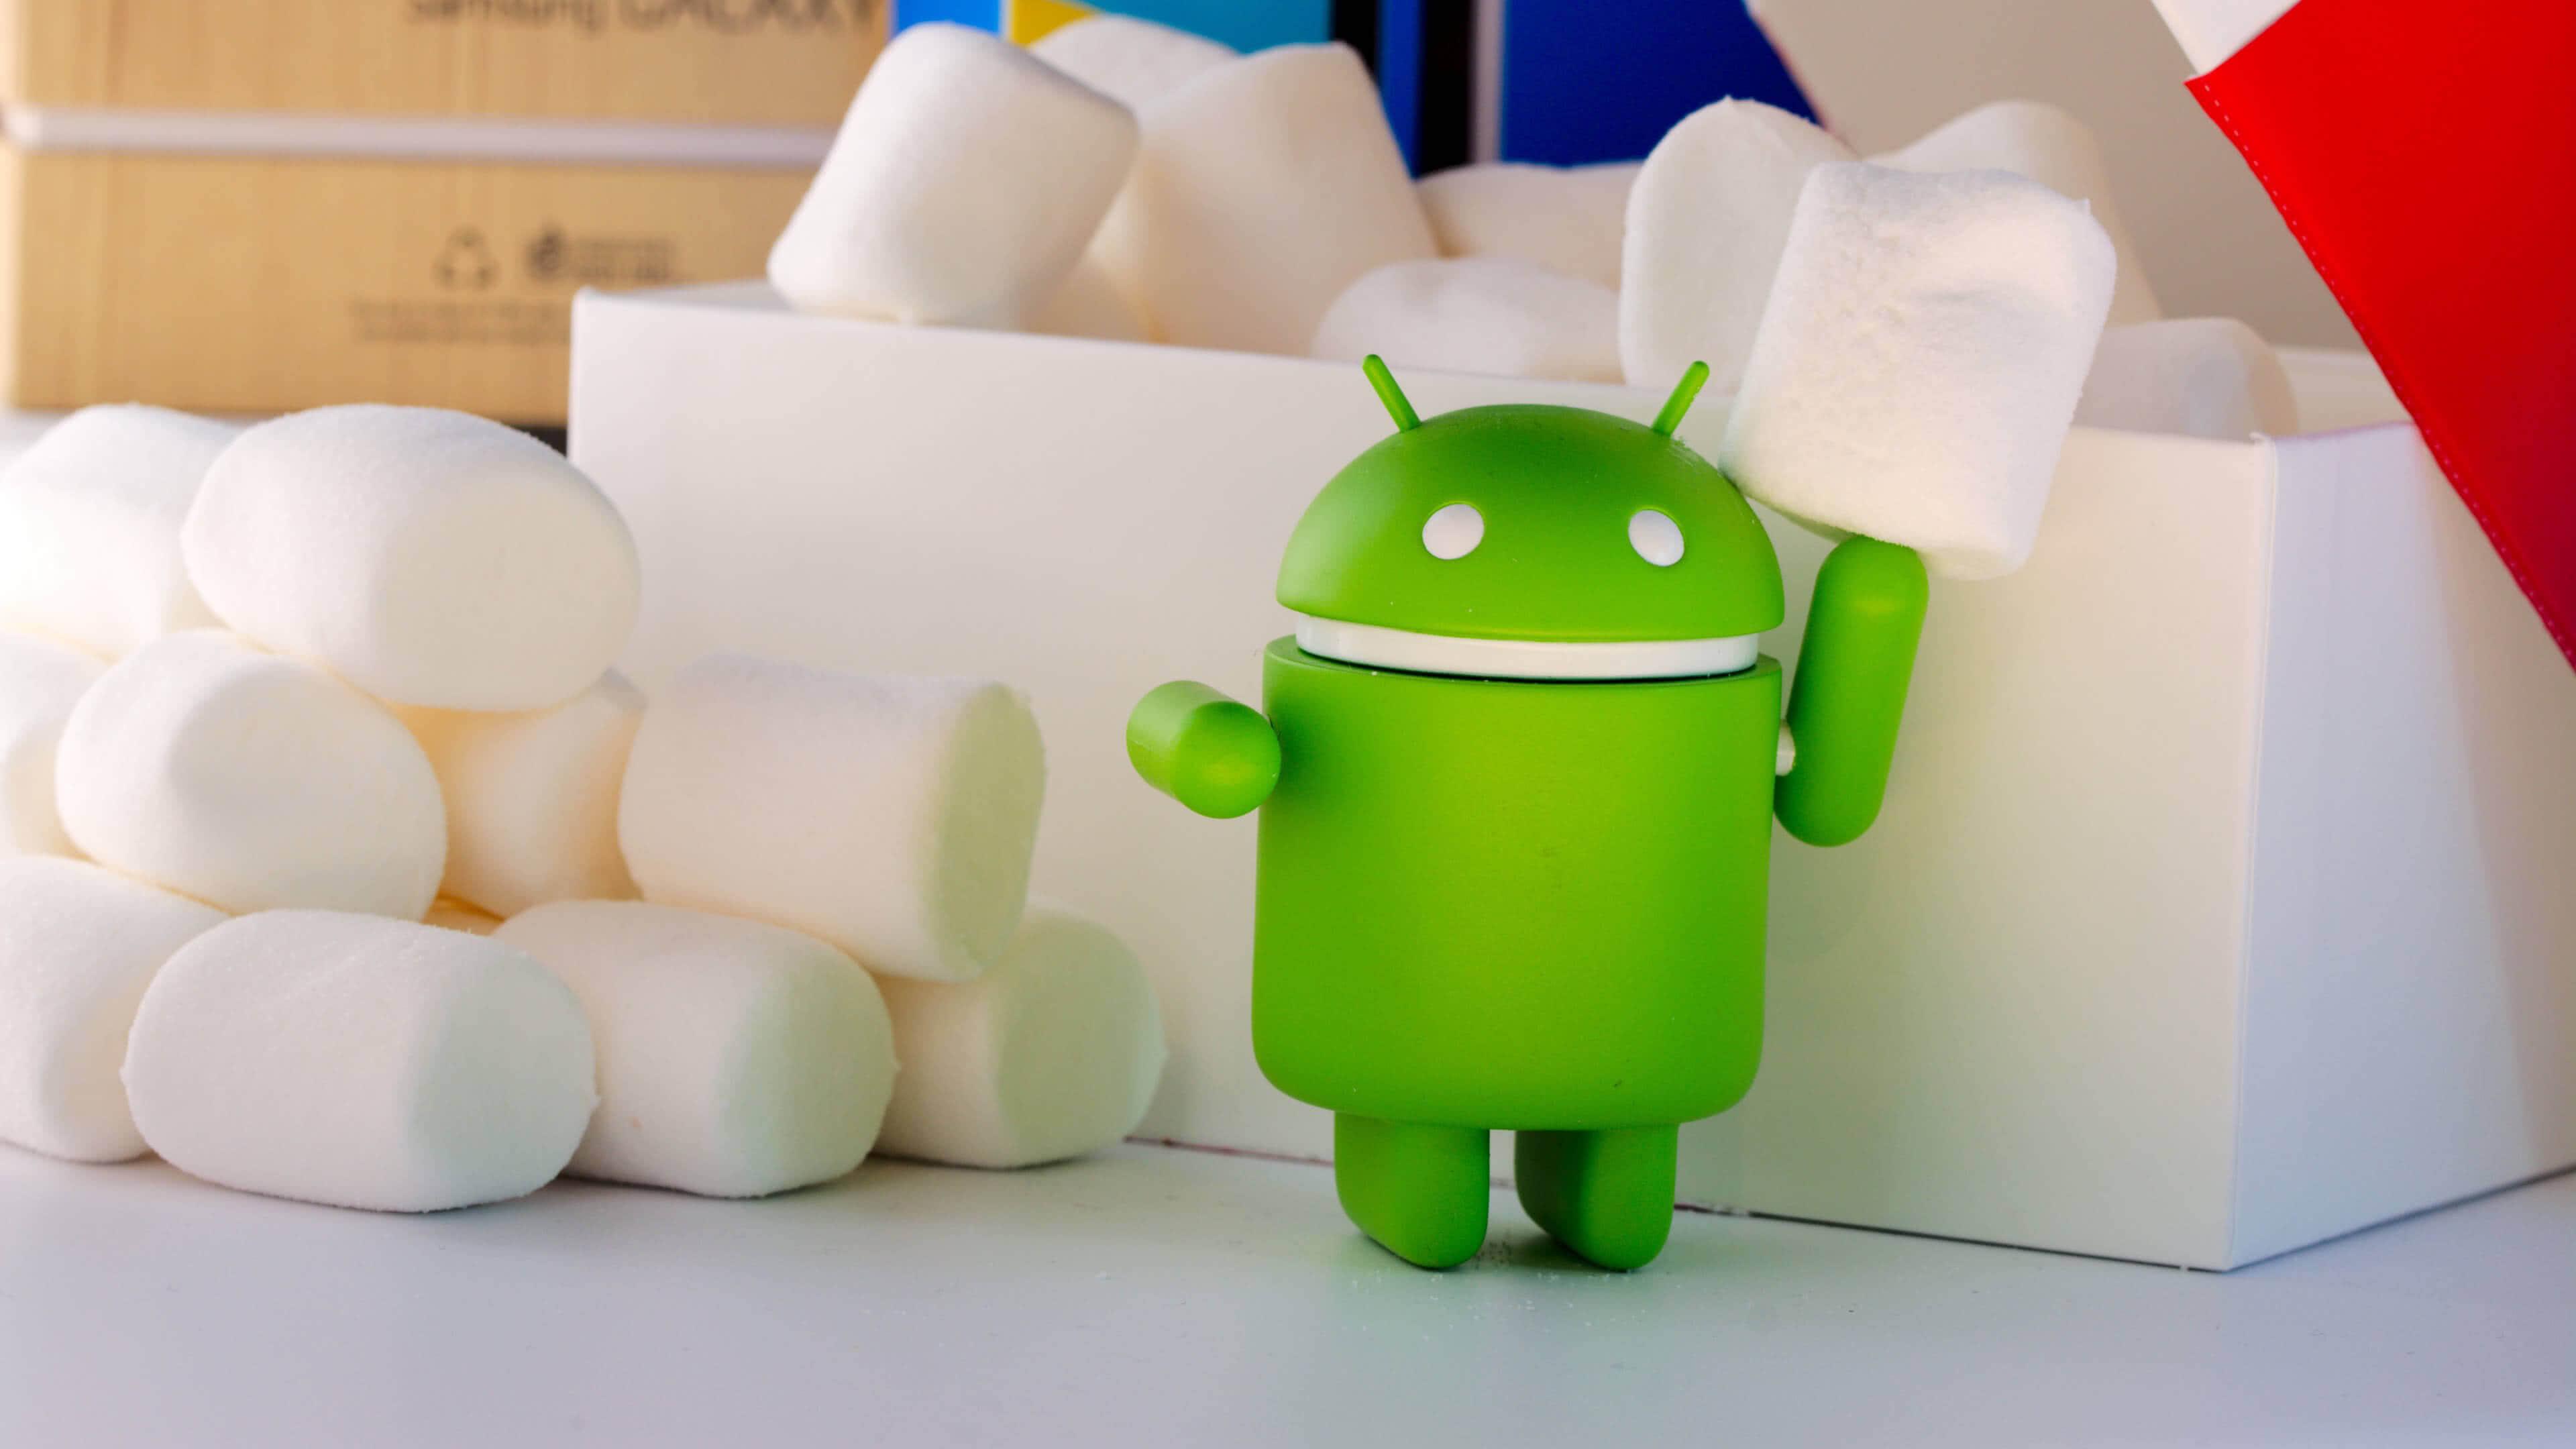 green android figurine marshmallow uhd 4k wallpaper